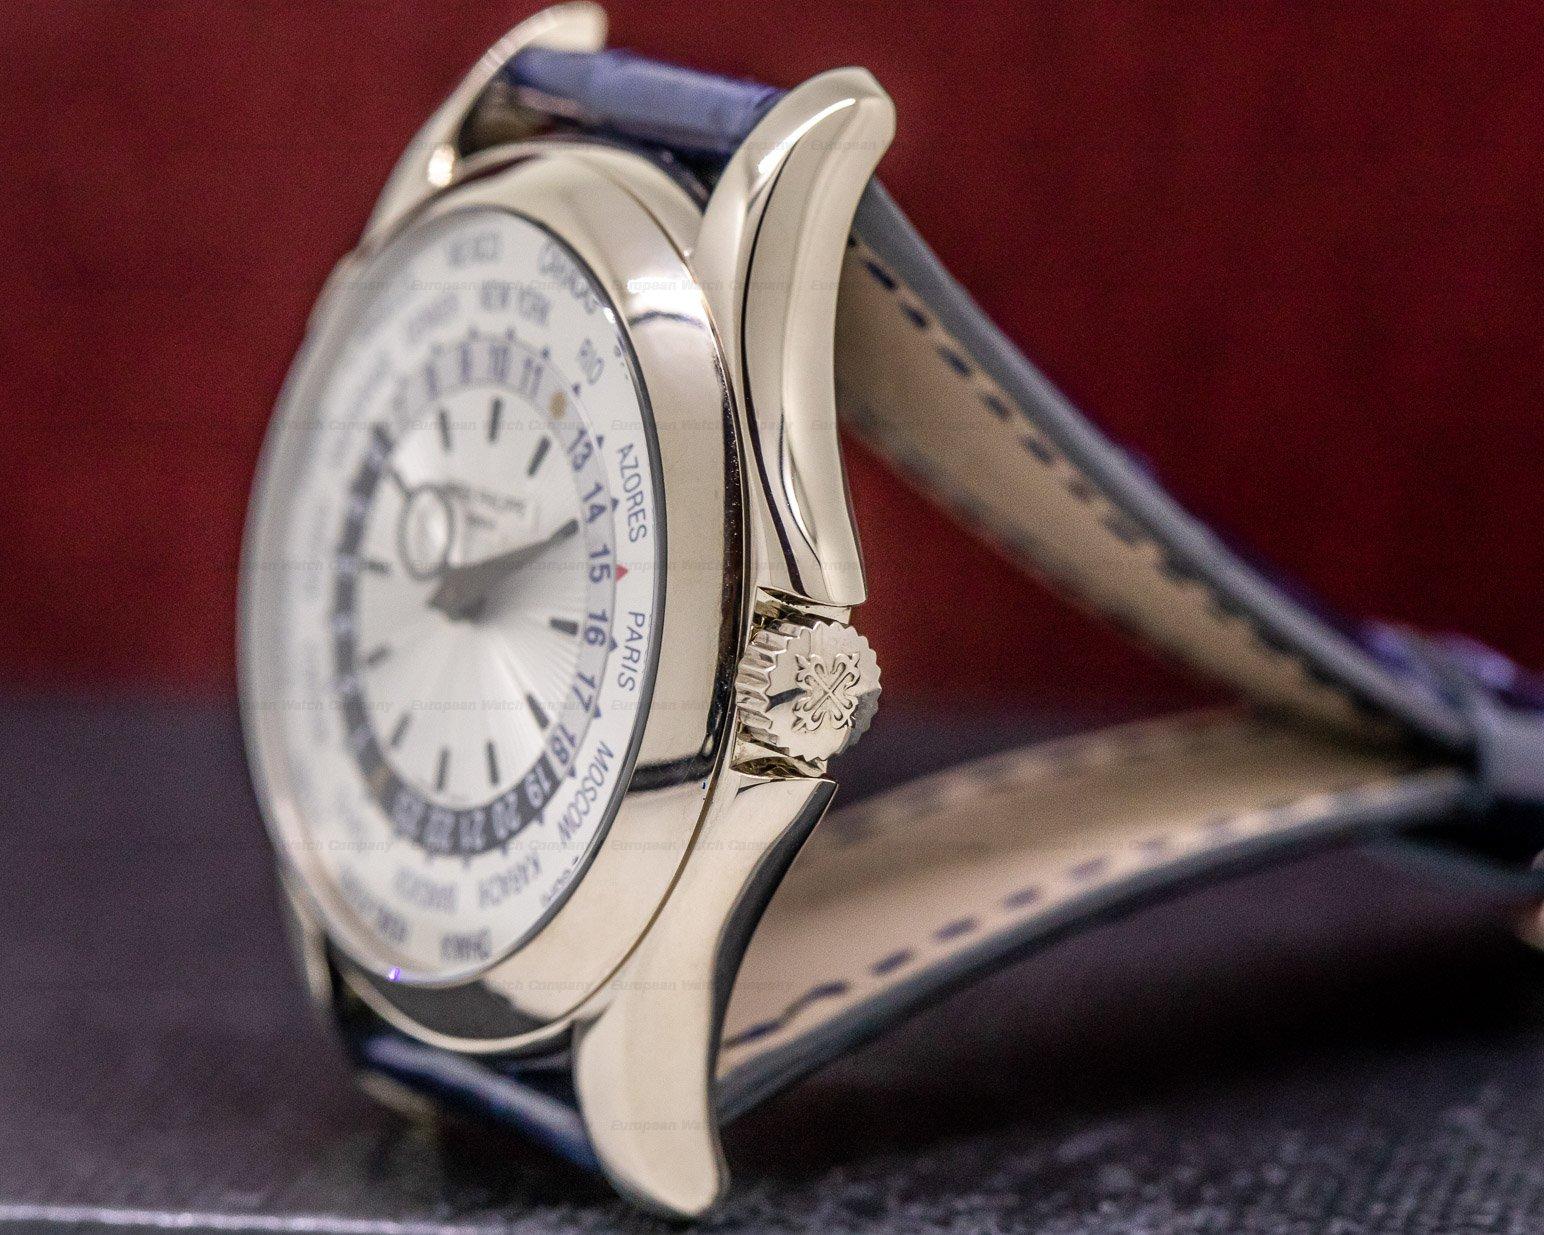 Patek Philippe 5130G-001 World Time 18K White Gold Silver Dial